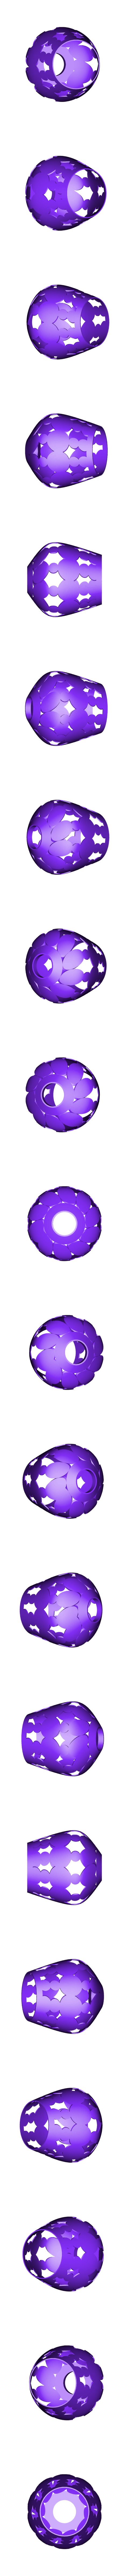 bubble V 4 .stl Download STL file bubble lamp shade • 3D printing design, motek